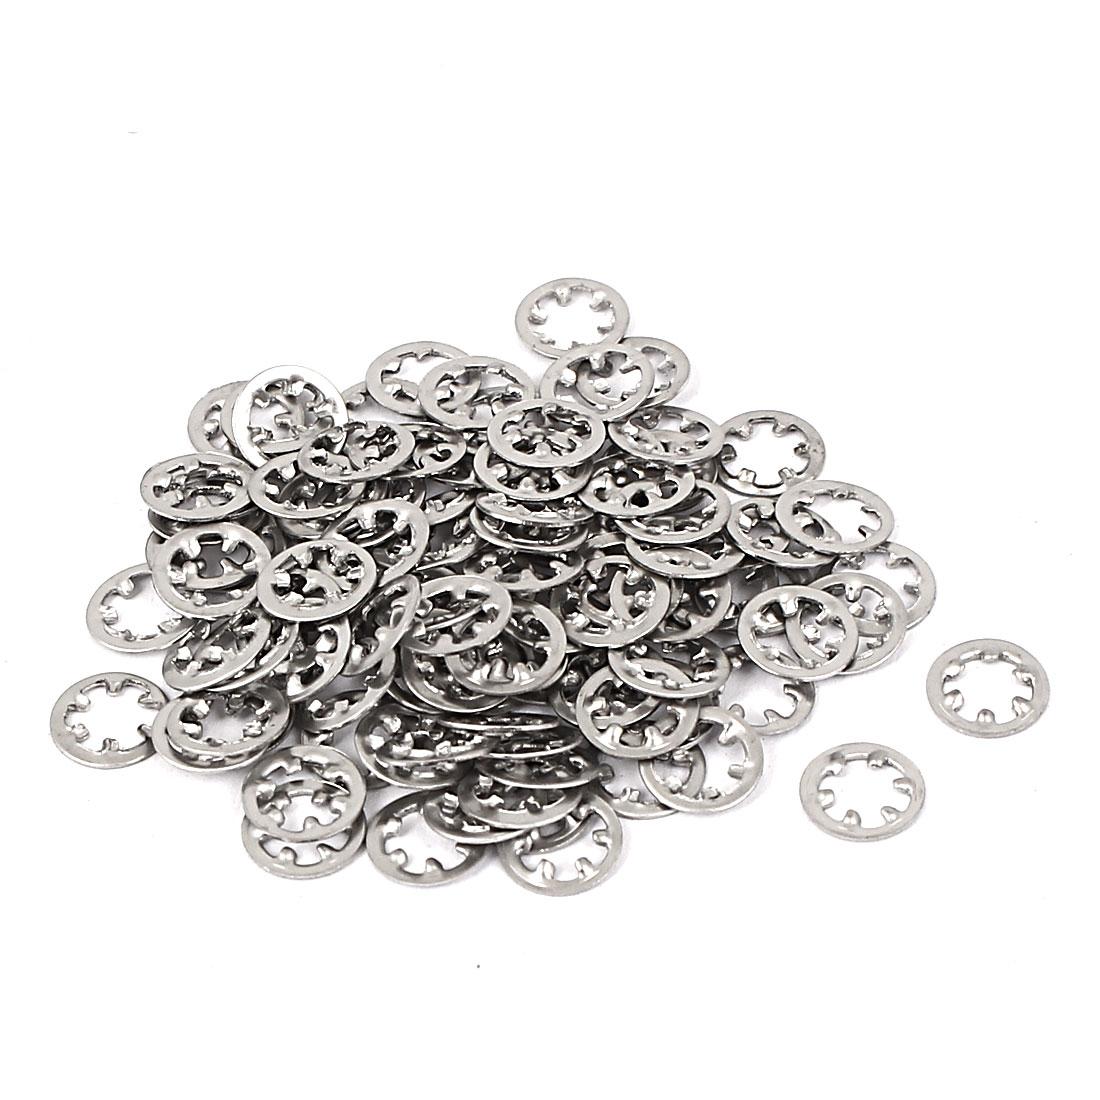 M3 304 Stainless Steel Internal Star Lock Washers 100 Pcs